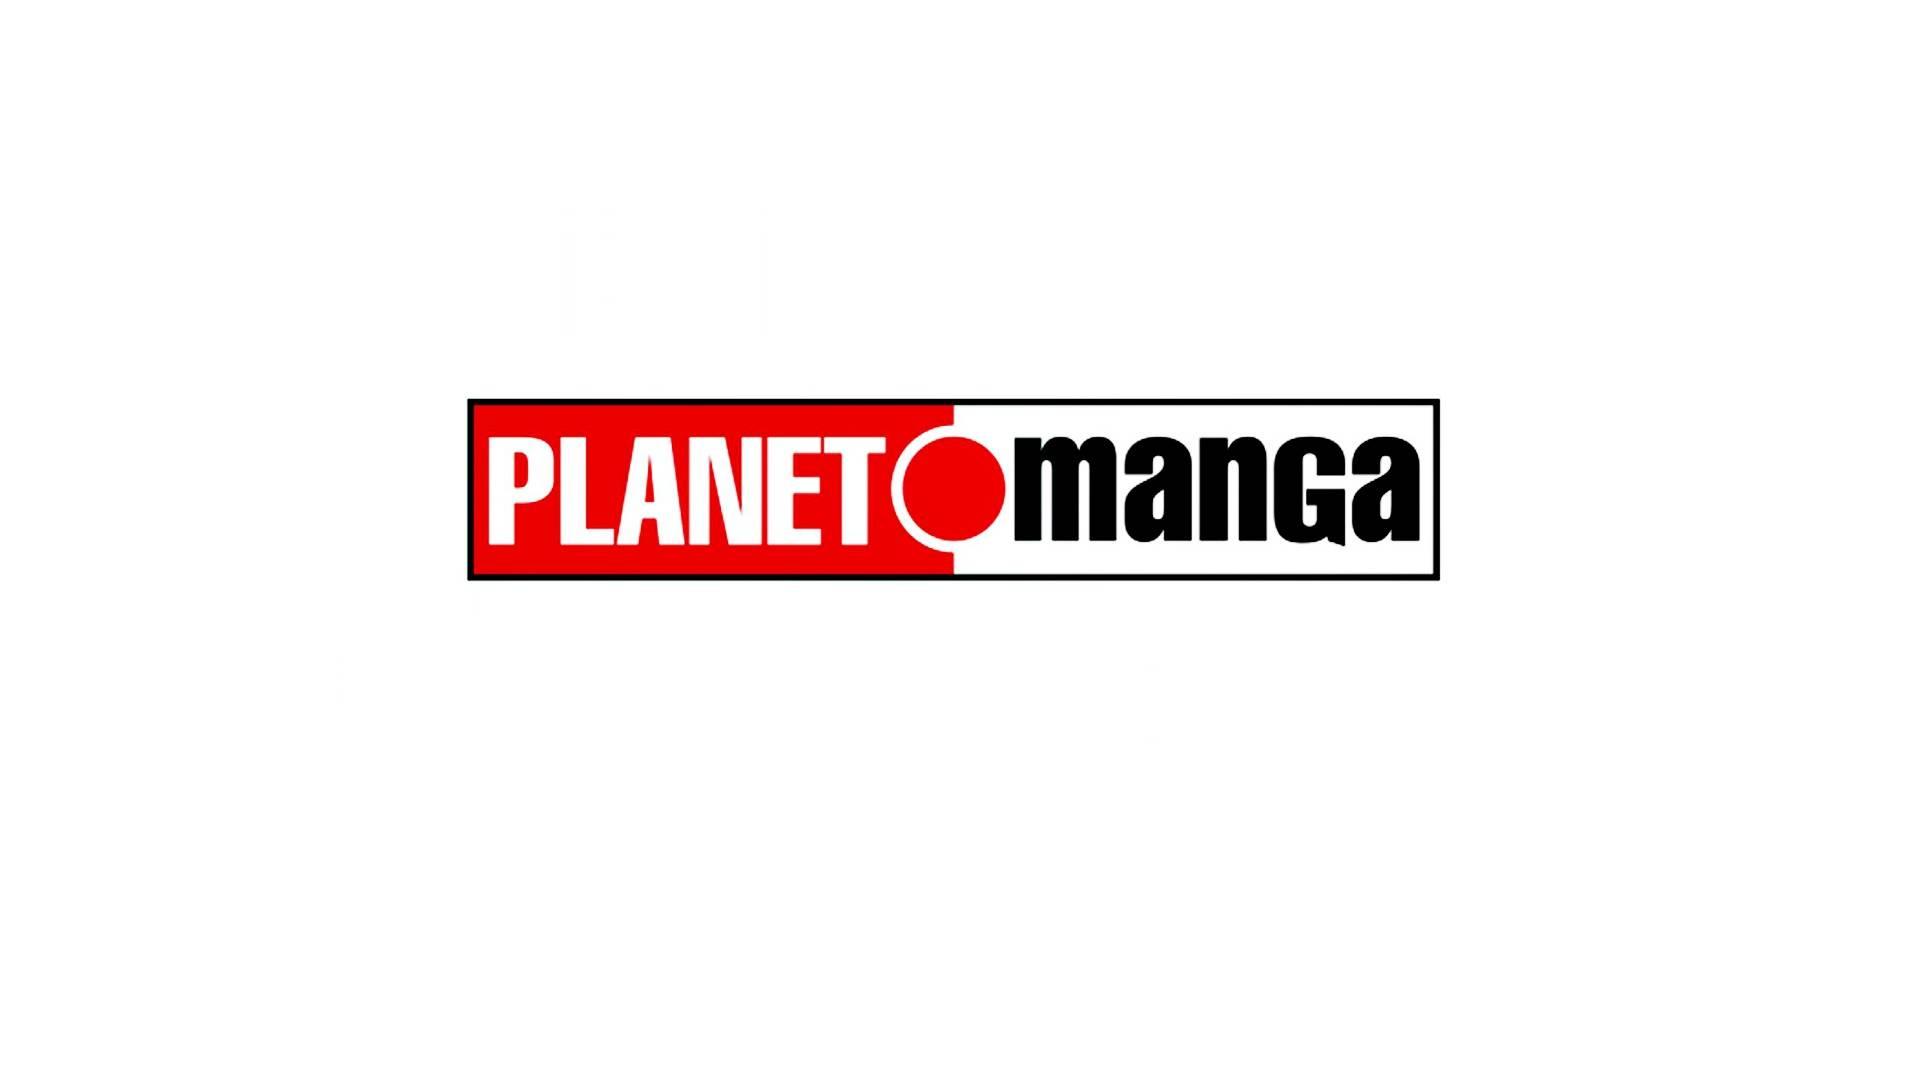 planet_manga_logo